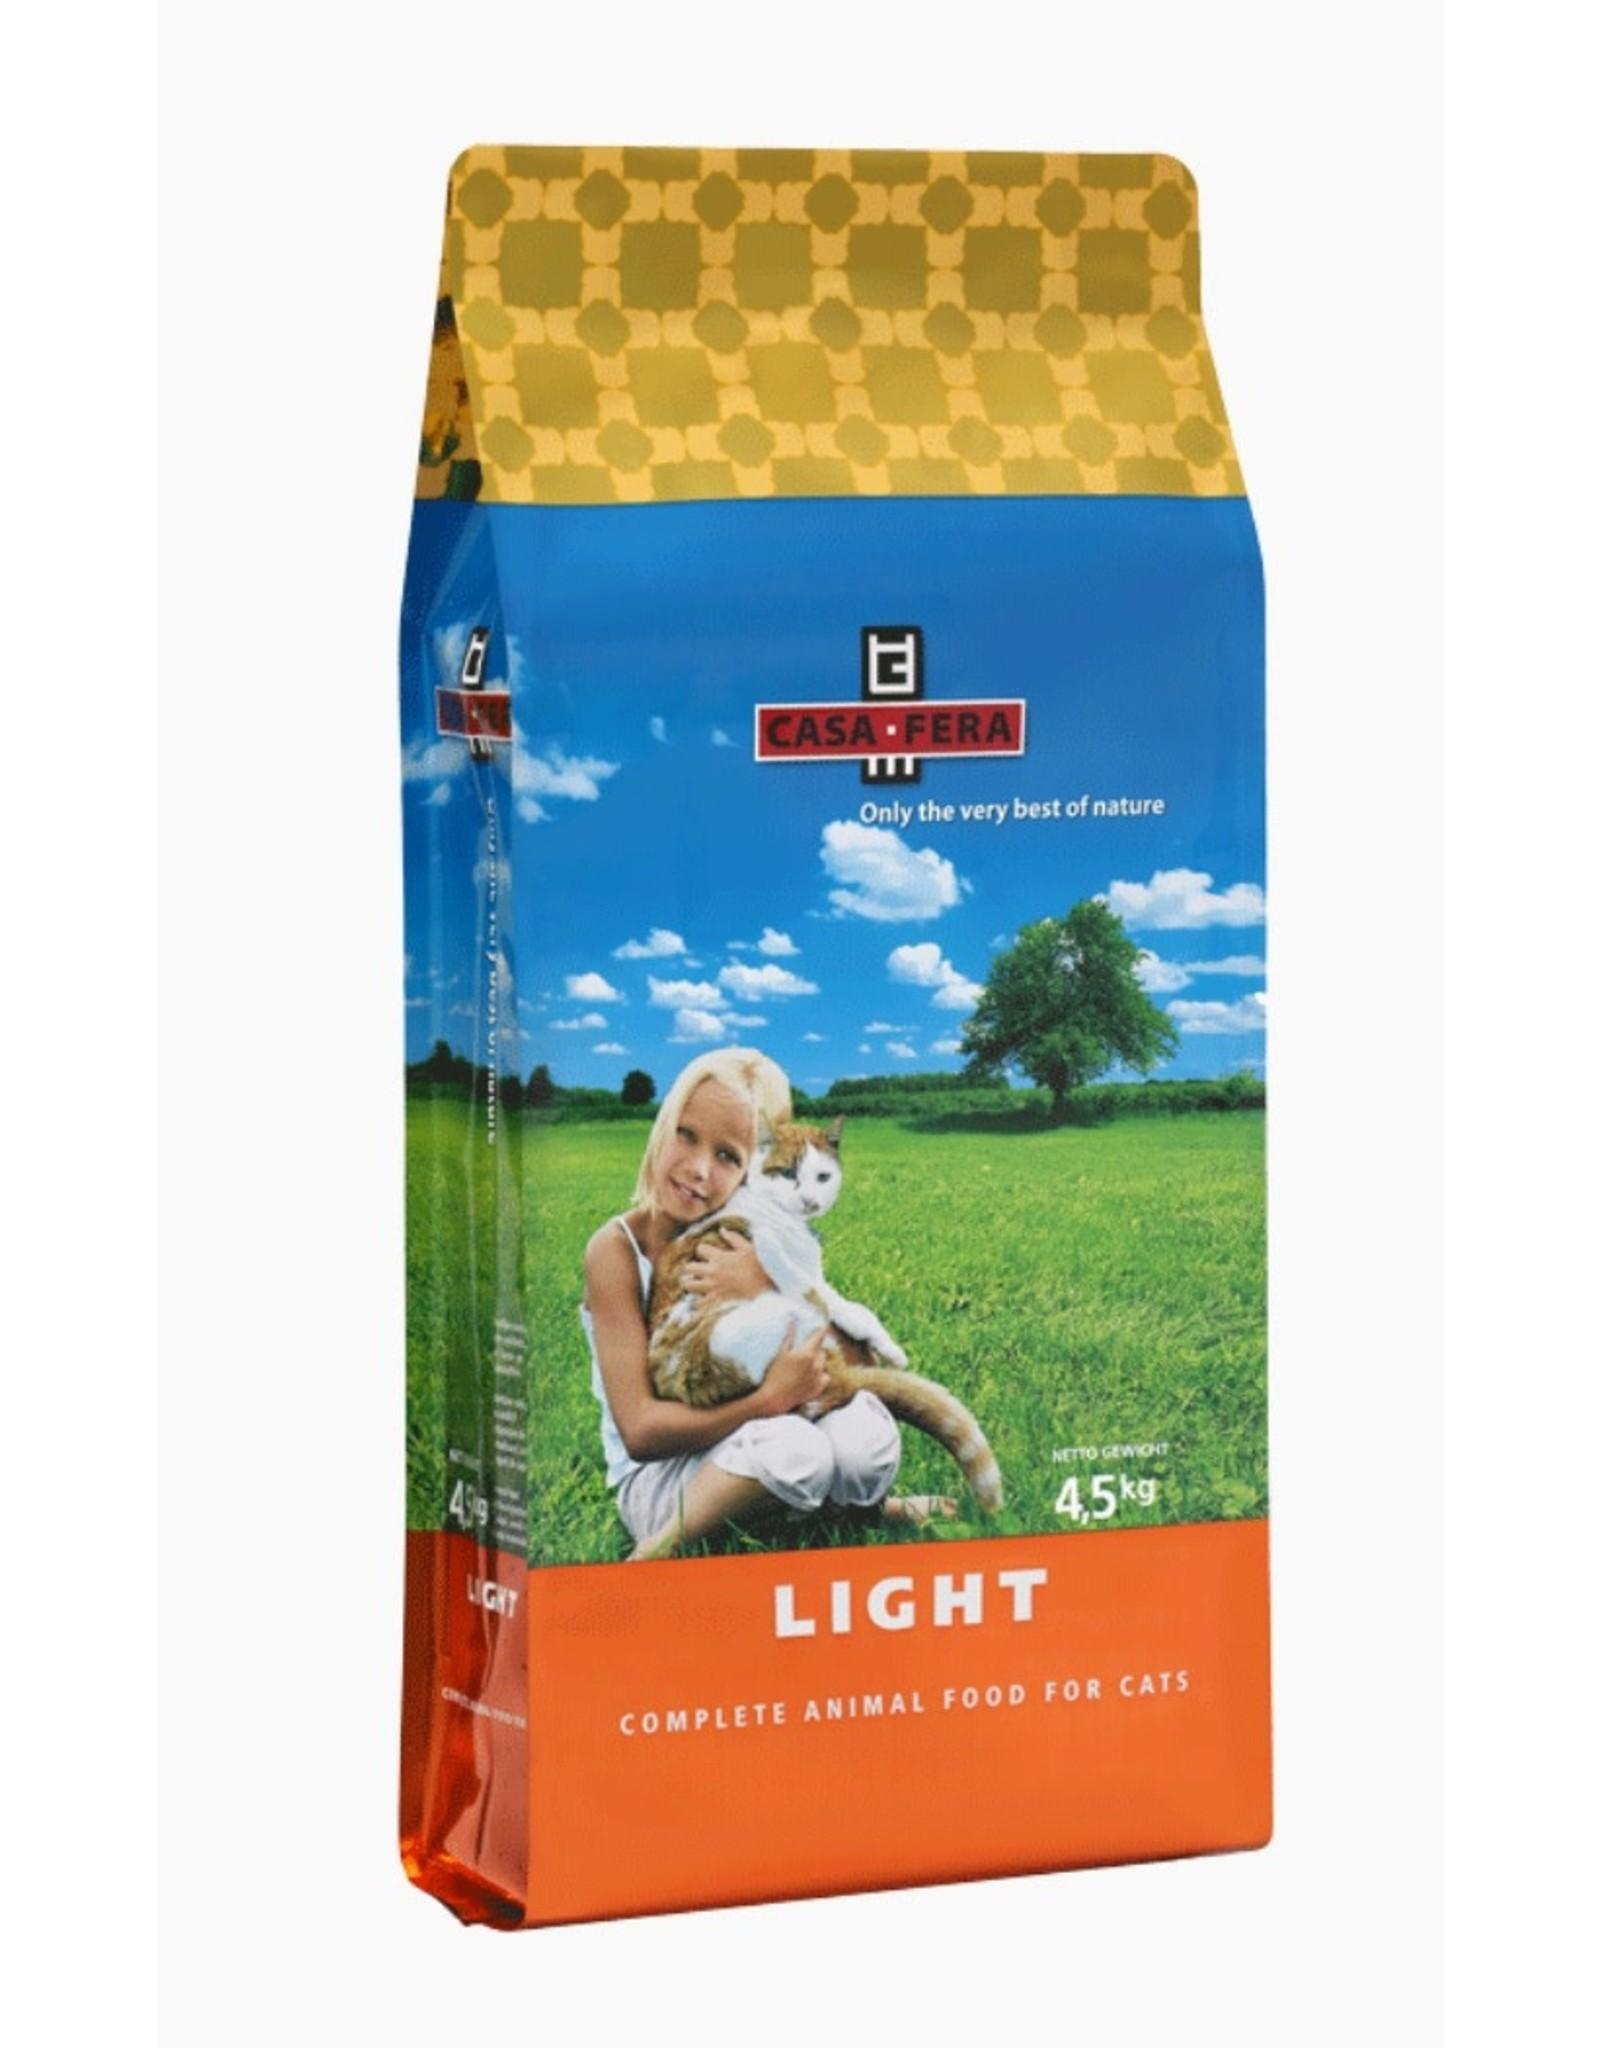 Casa-Fera Cat Light 4,5Kg